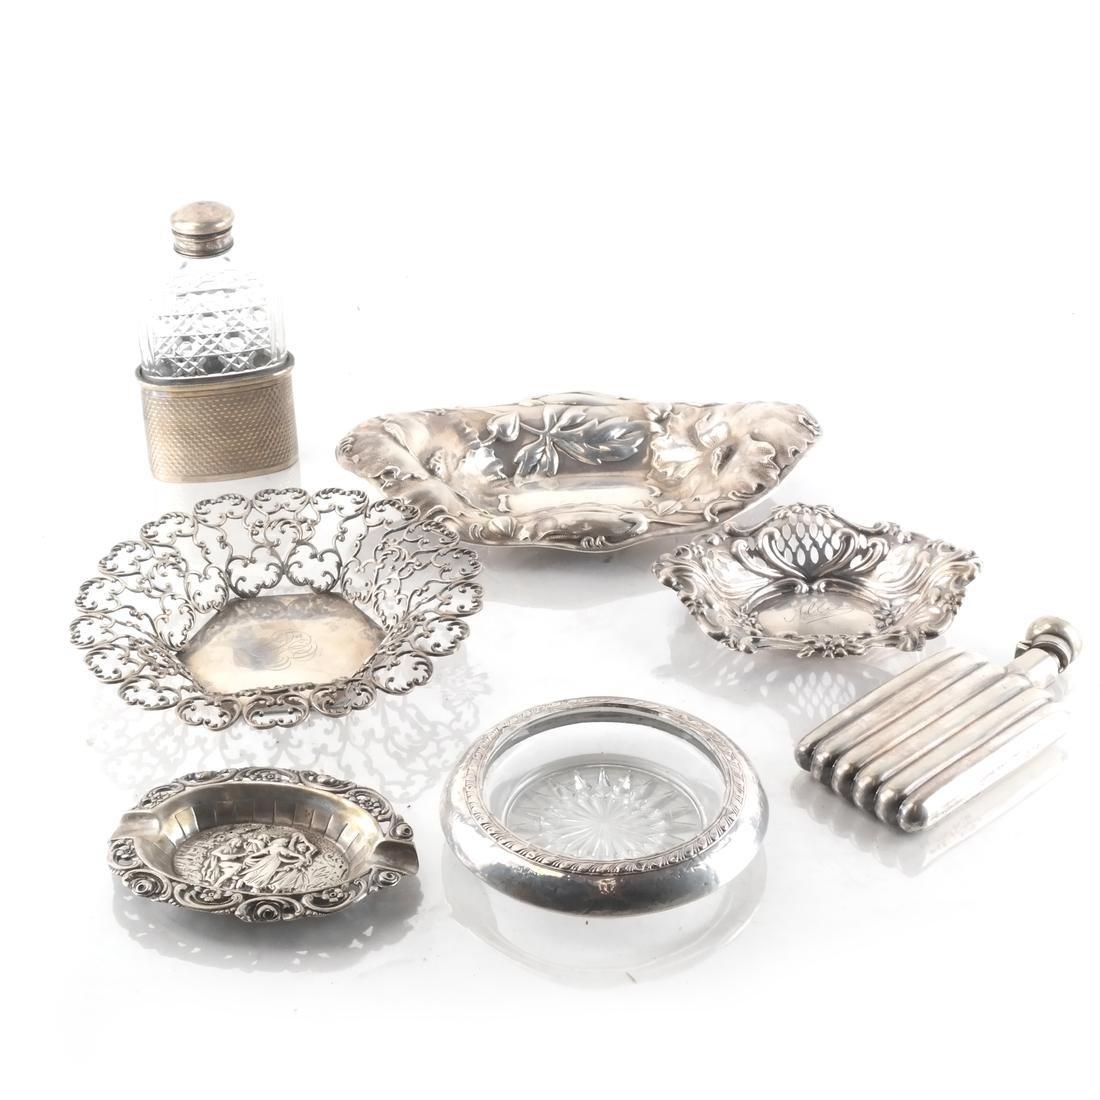 Asst. Silver Pin Trays, Receivers, Flasks